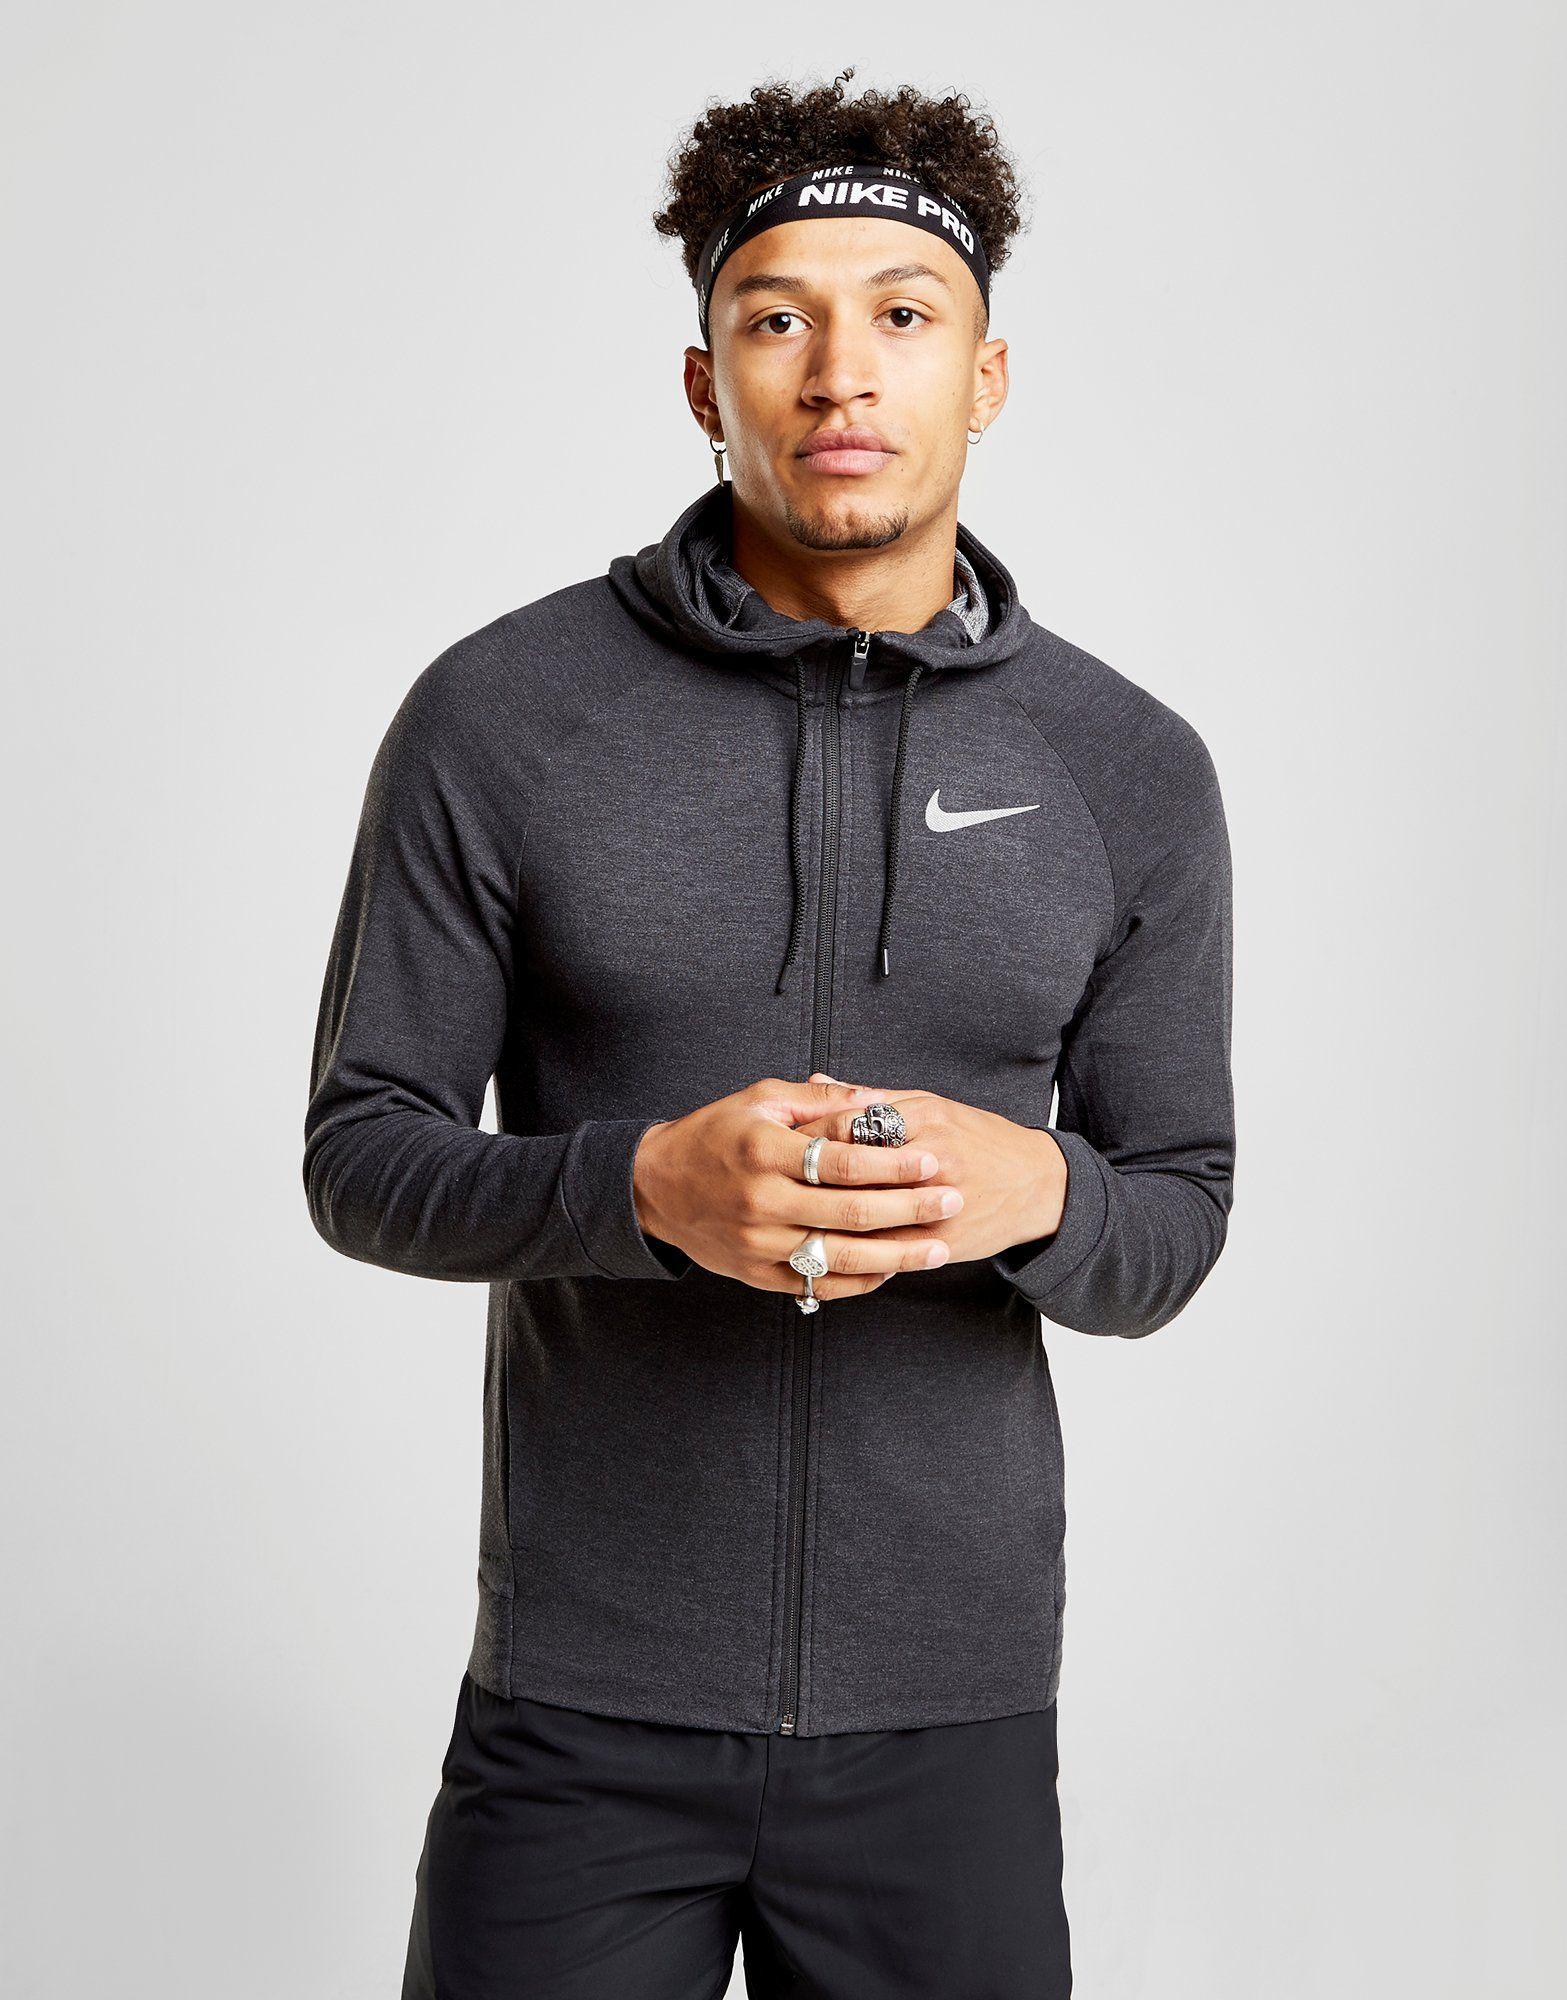 27d8c1c5b NIKE Nike Dri-FIT Men's Full-Zip Training Hoodie | JD Sports